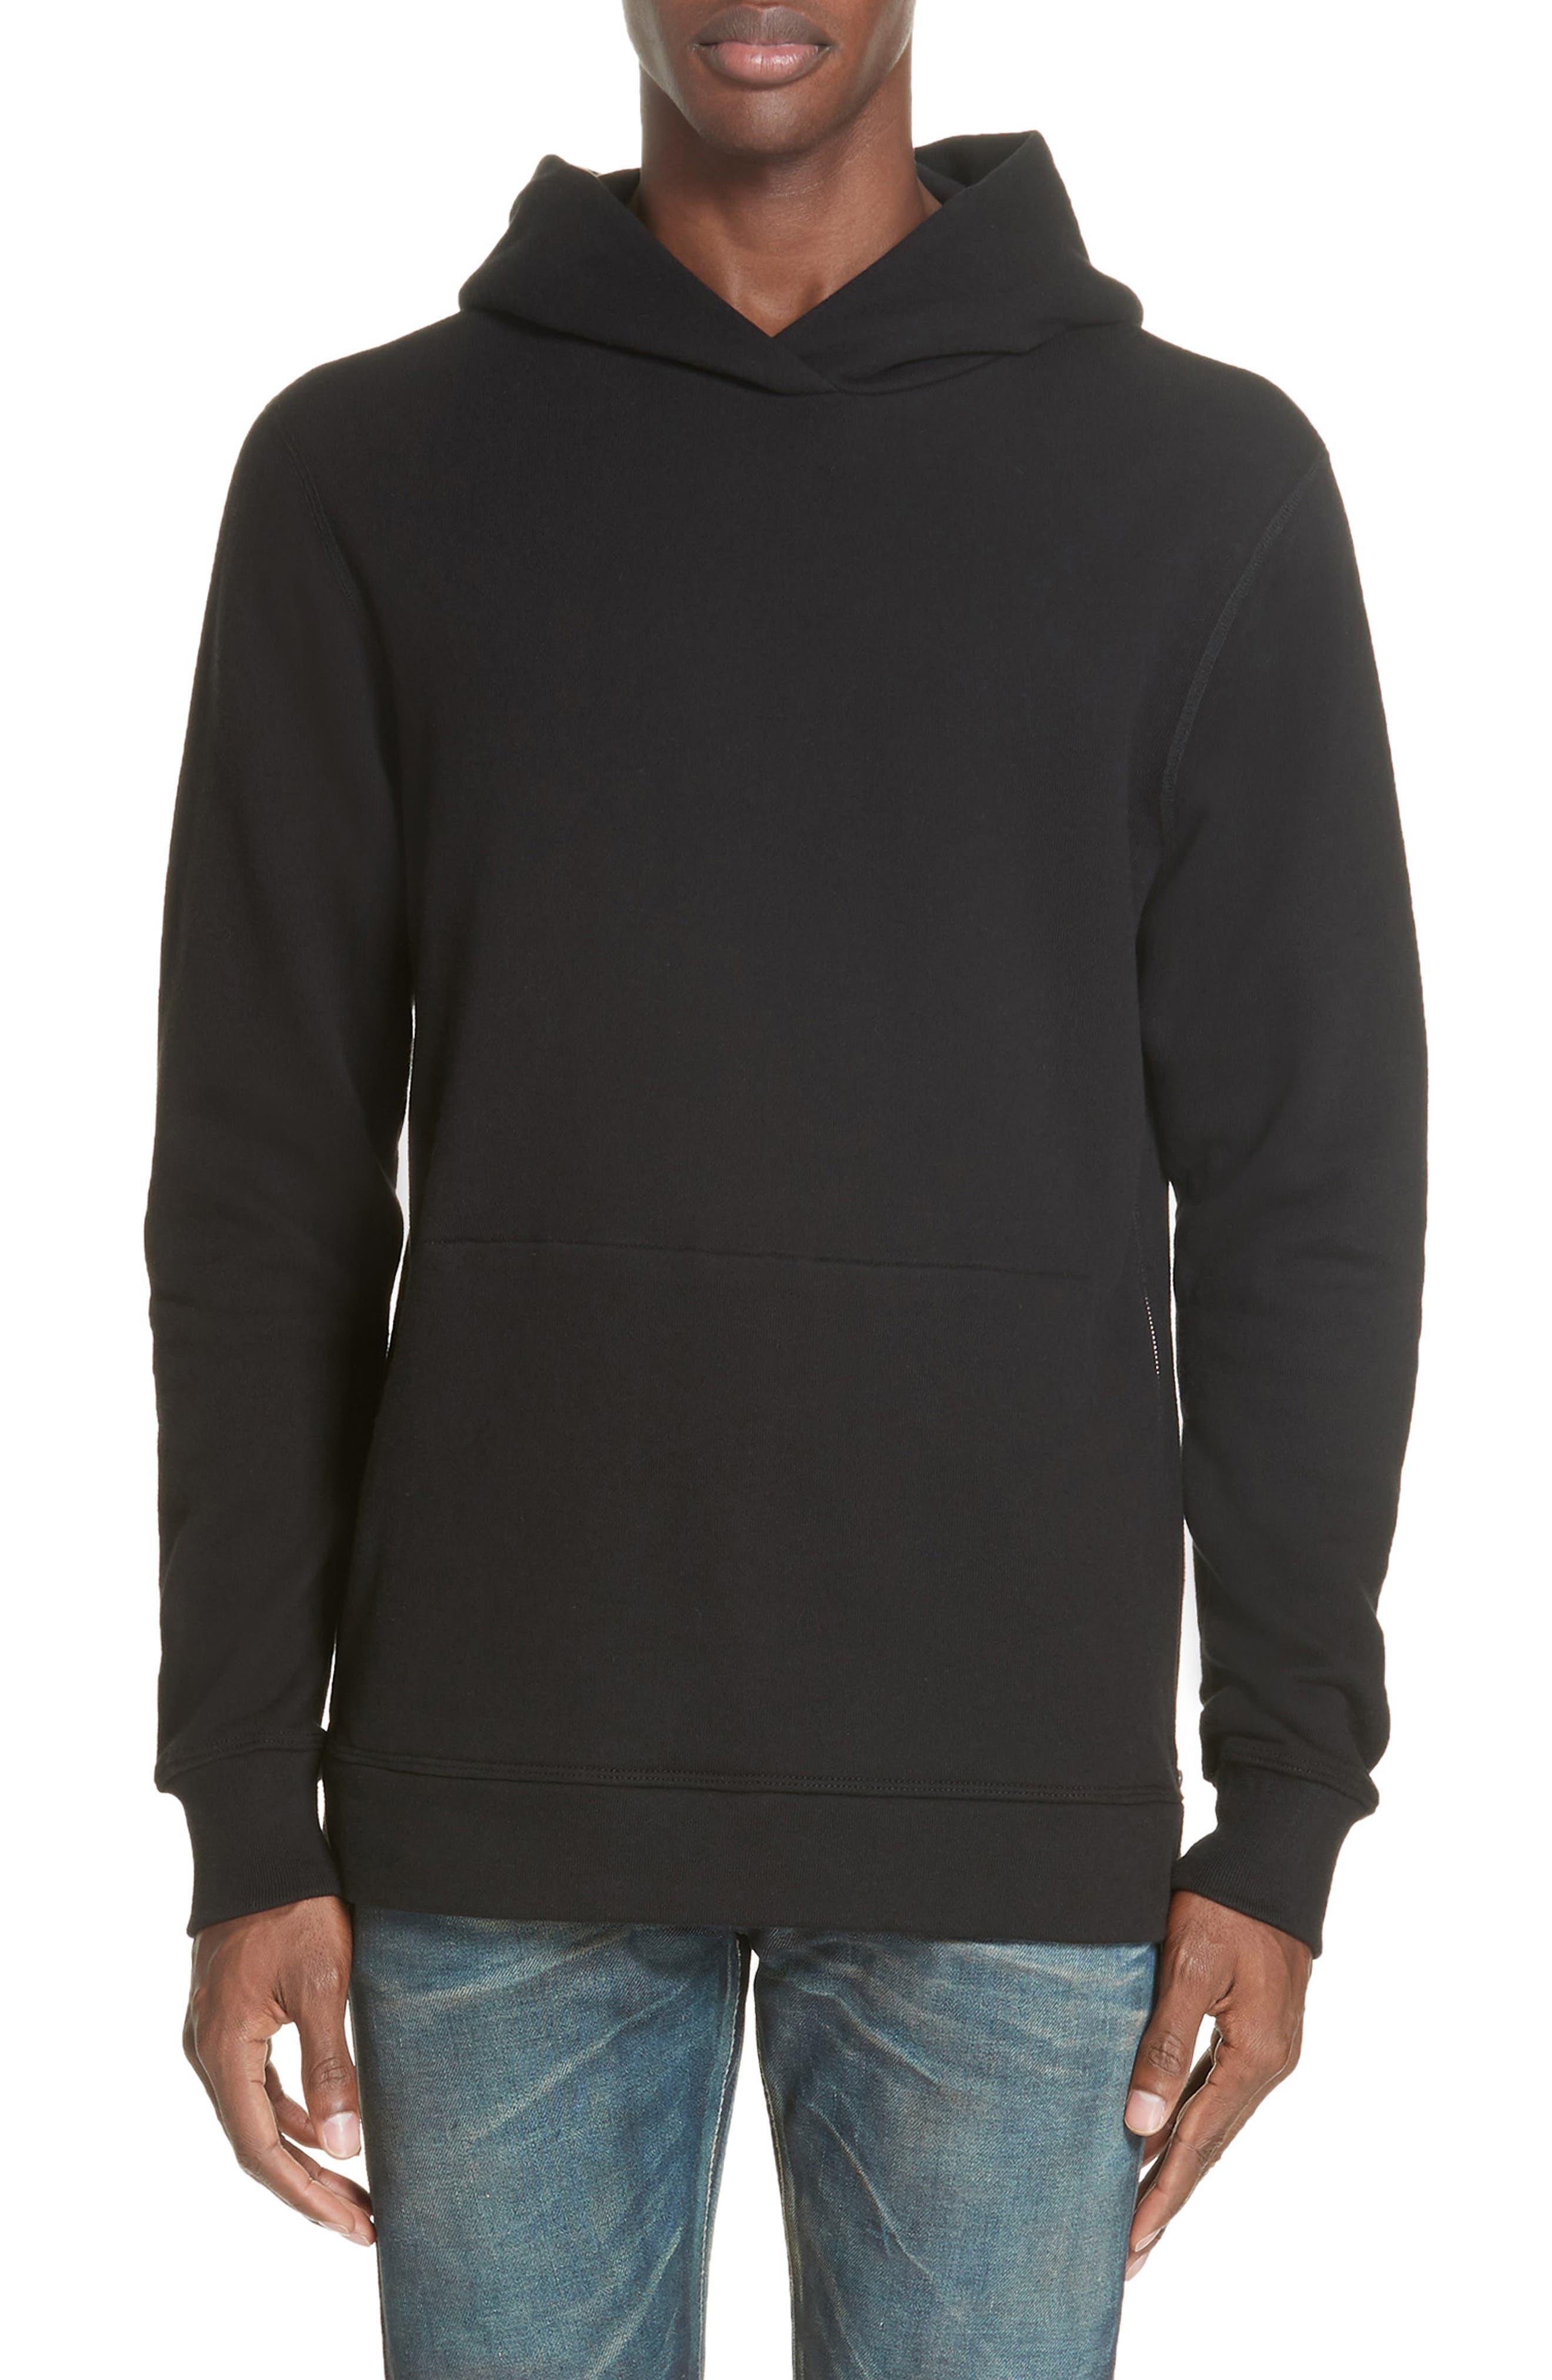 JOHN ELLIOTT Hooded Villain Sweatshirt, Main, color, BLACK